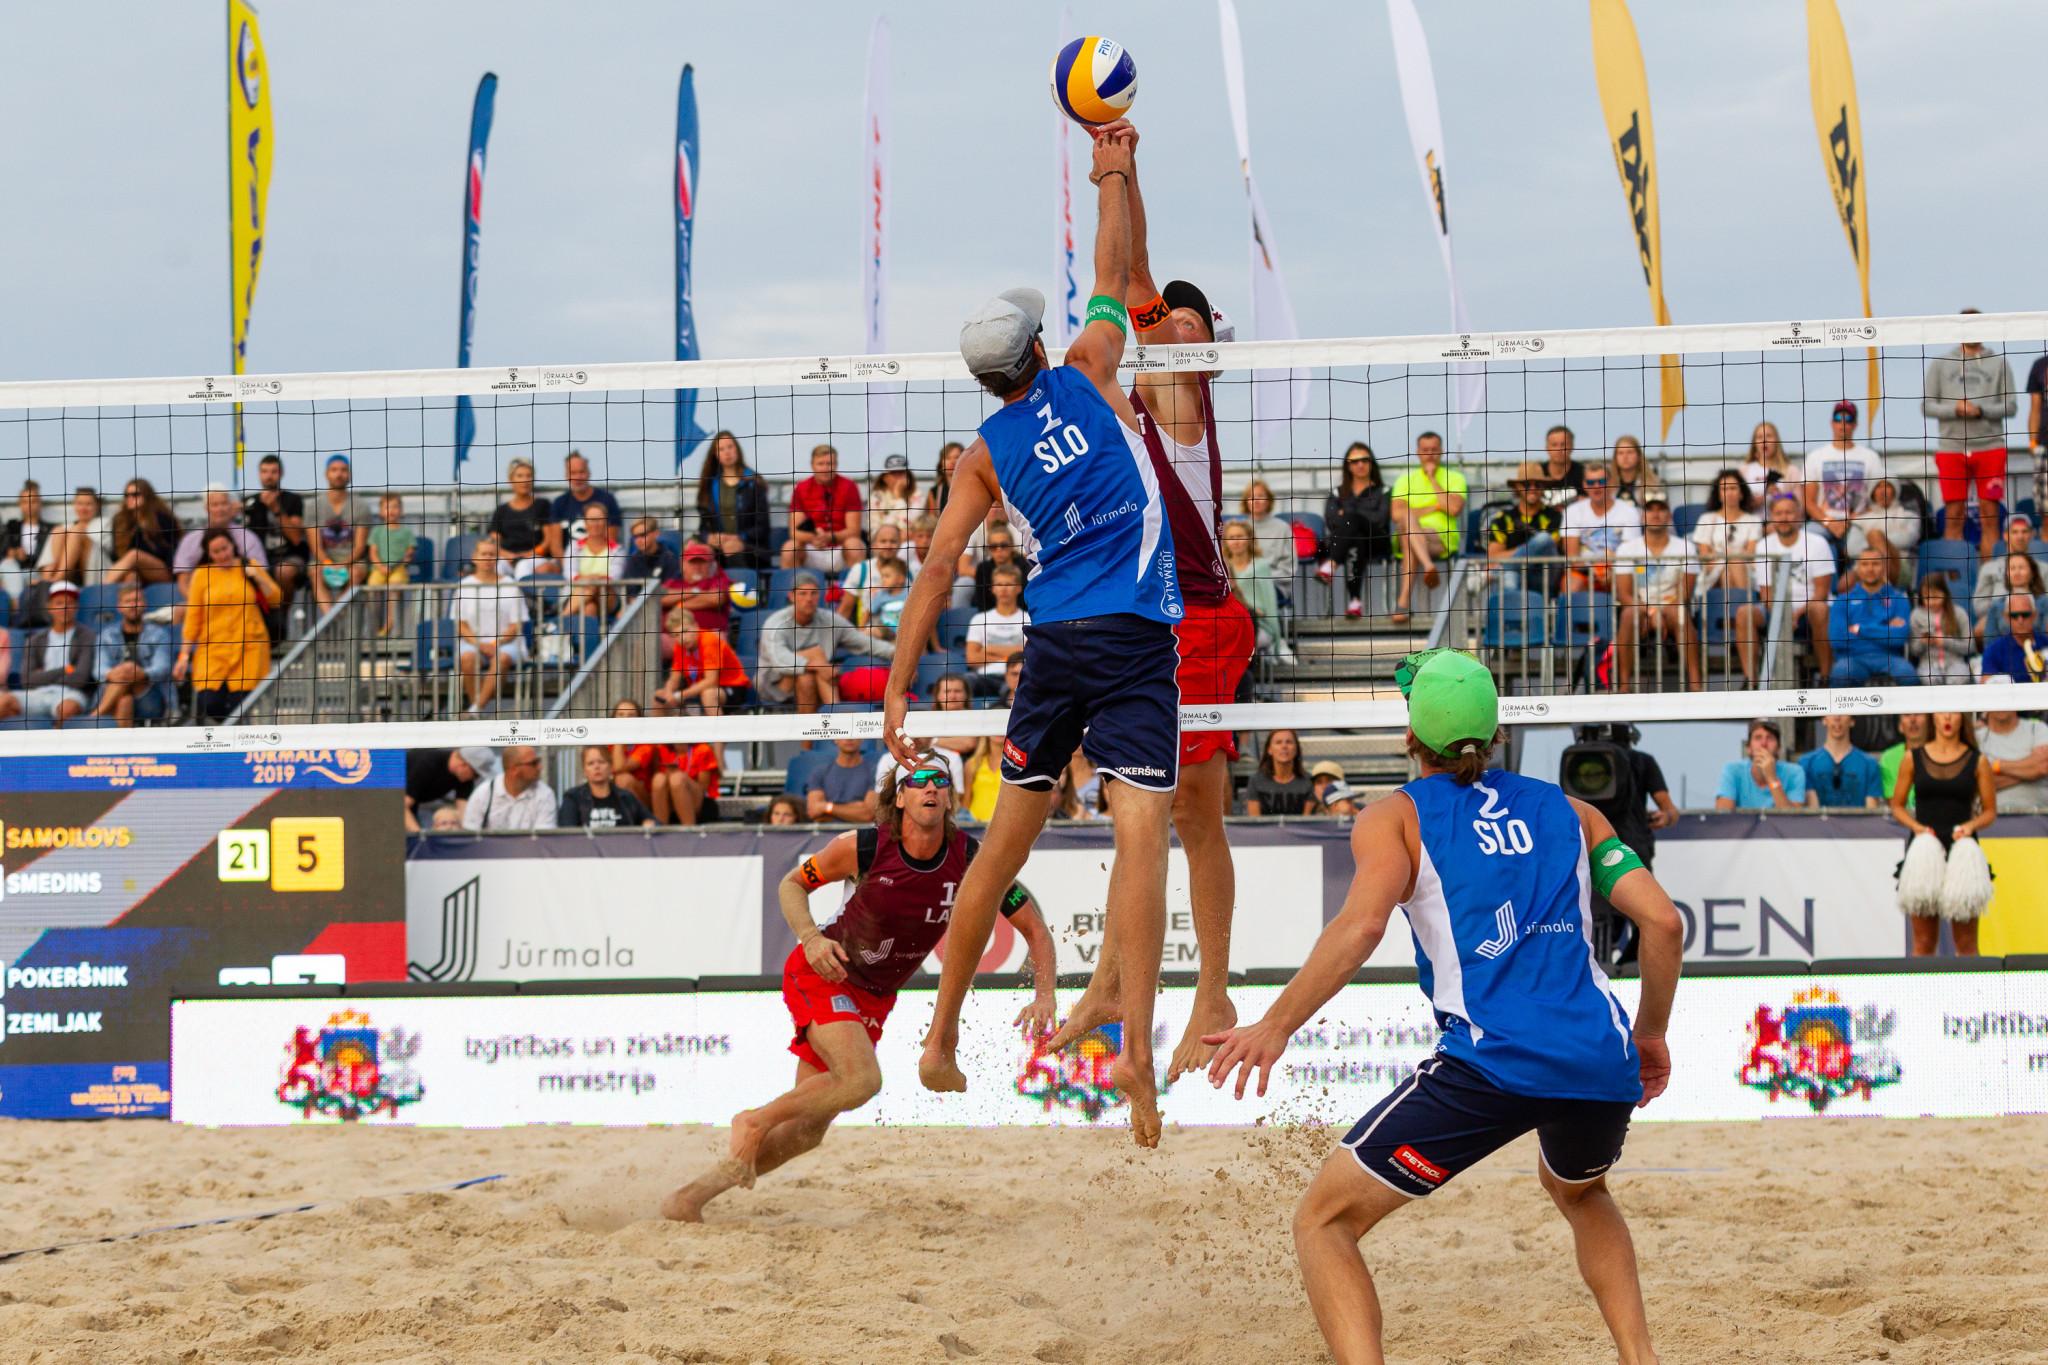 Samoilovs and Šmēdiņš make semi-finals at FIVB Beach Volleyball World Tour in Jūrmala